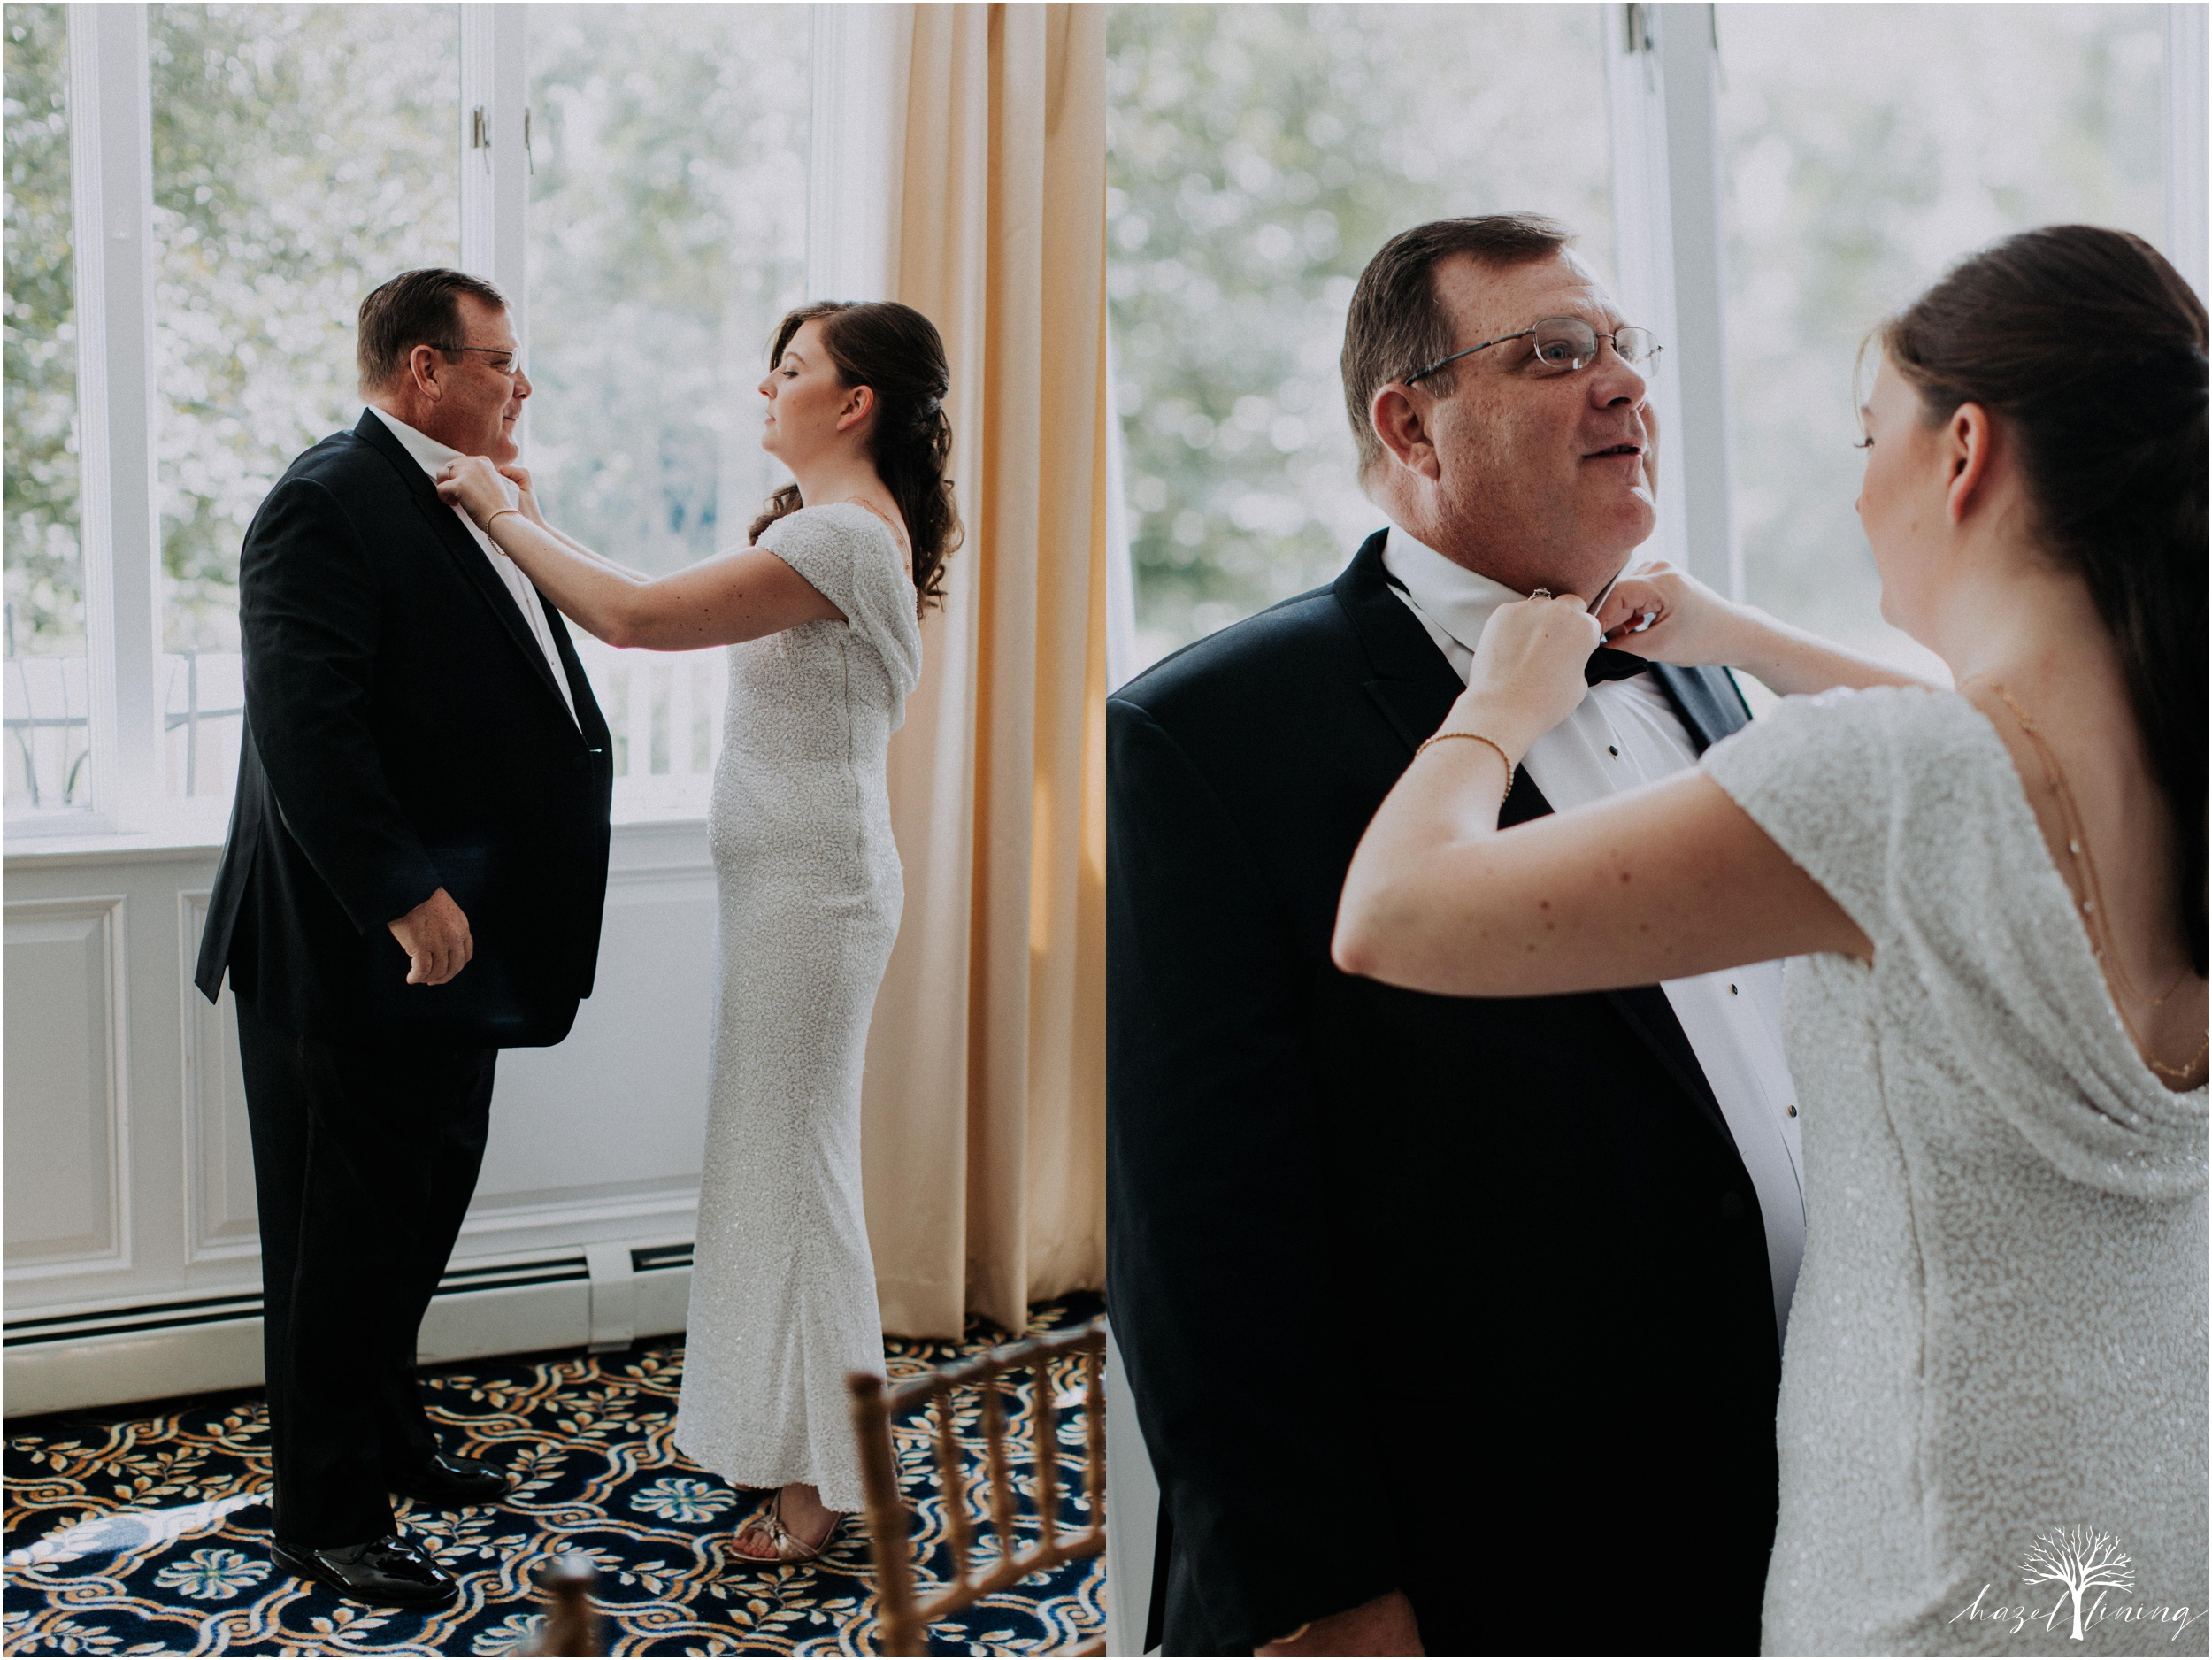 elizabeth-doelp-andrew-foreback-middletown-country-club-summer-langhorne-pennsylvania-wedding-hazel-lining-travel-wedding-elopement-photography_0026.jpg